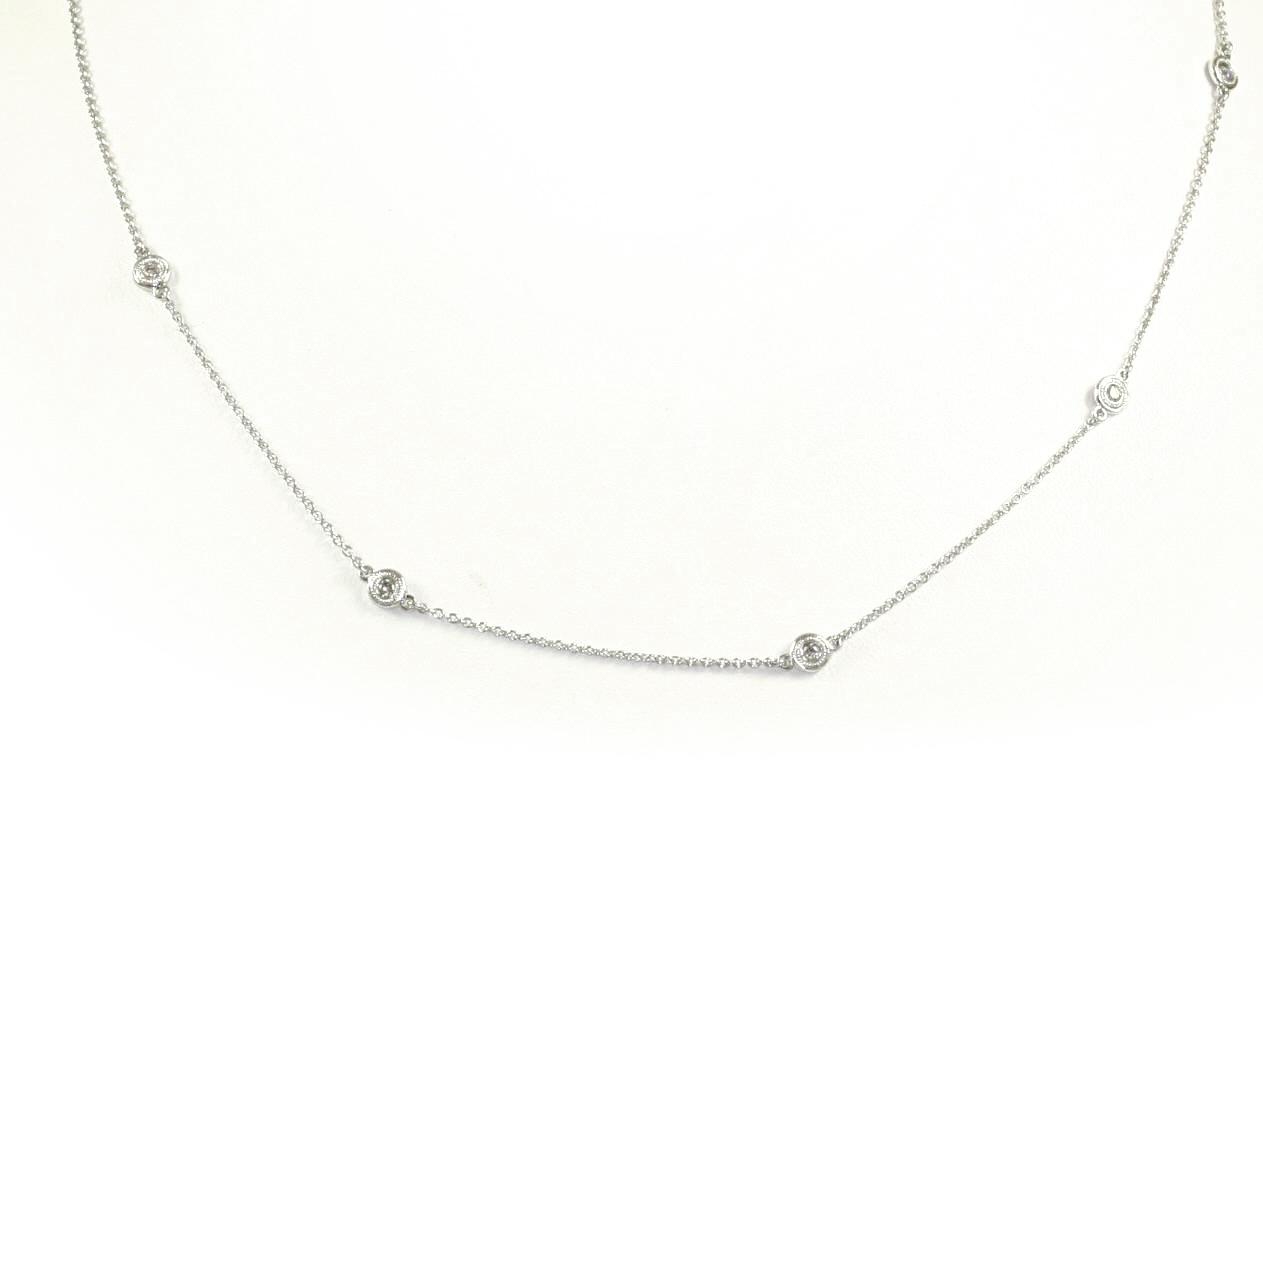 Beny Sofer 14 Karat White Gold Diamond Station Necklace with Milgrain